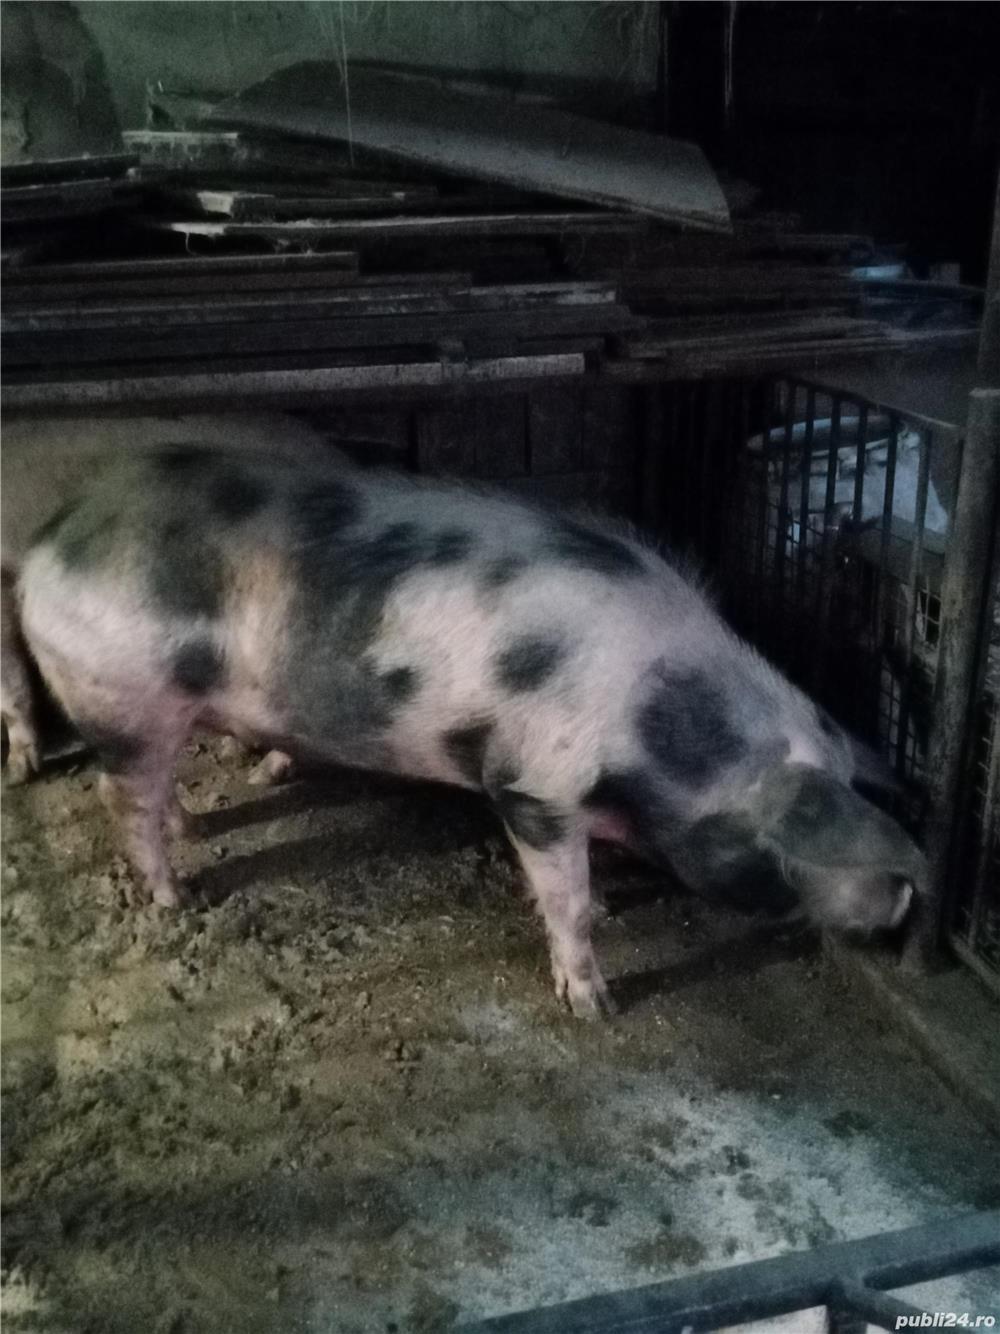 Porc pentru sacrificat